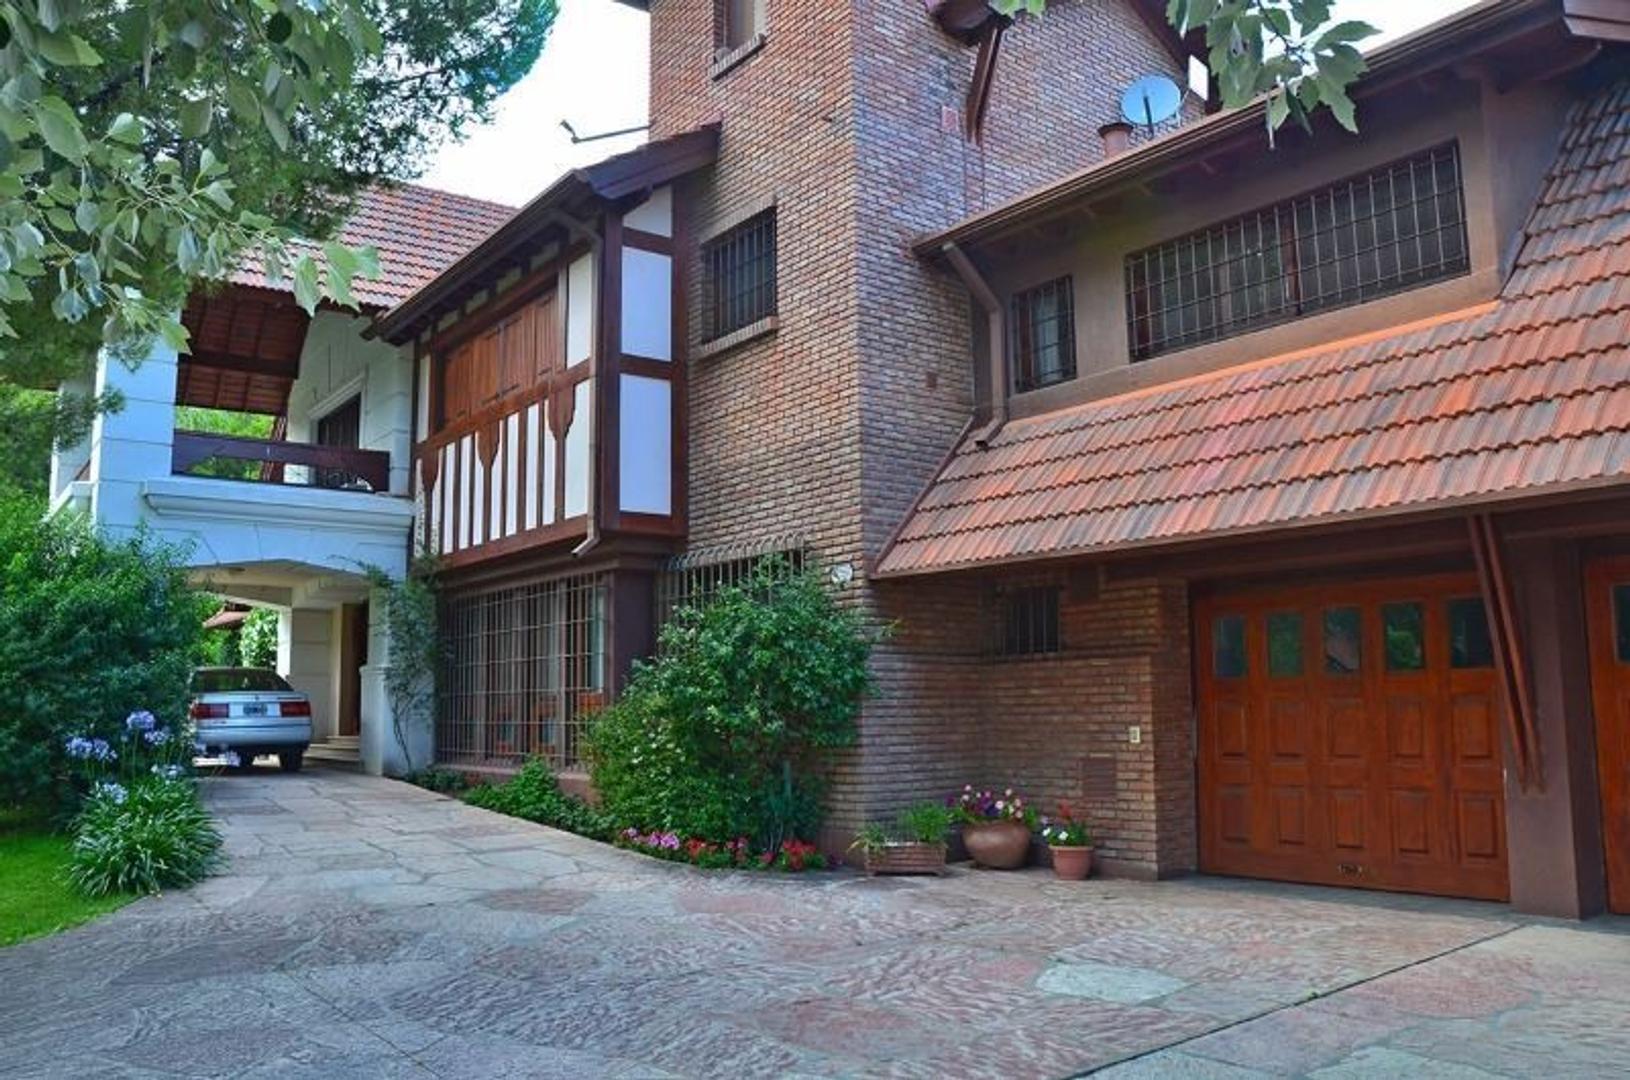 Emblemática residencia en Country Chumamaya